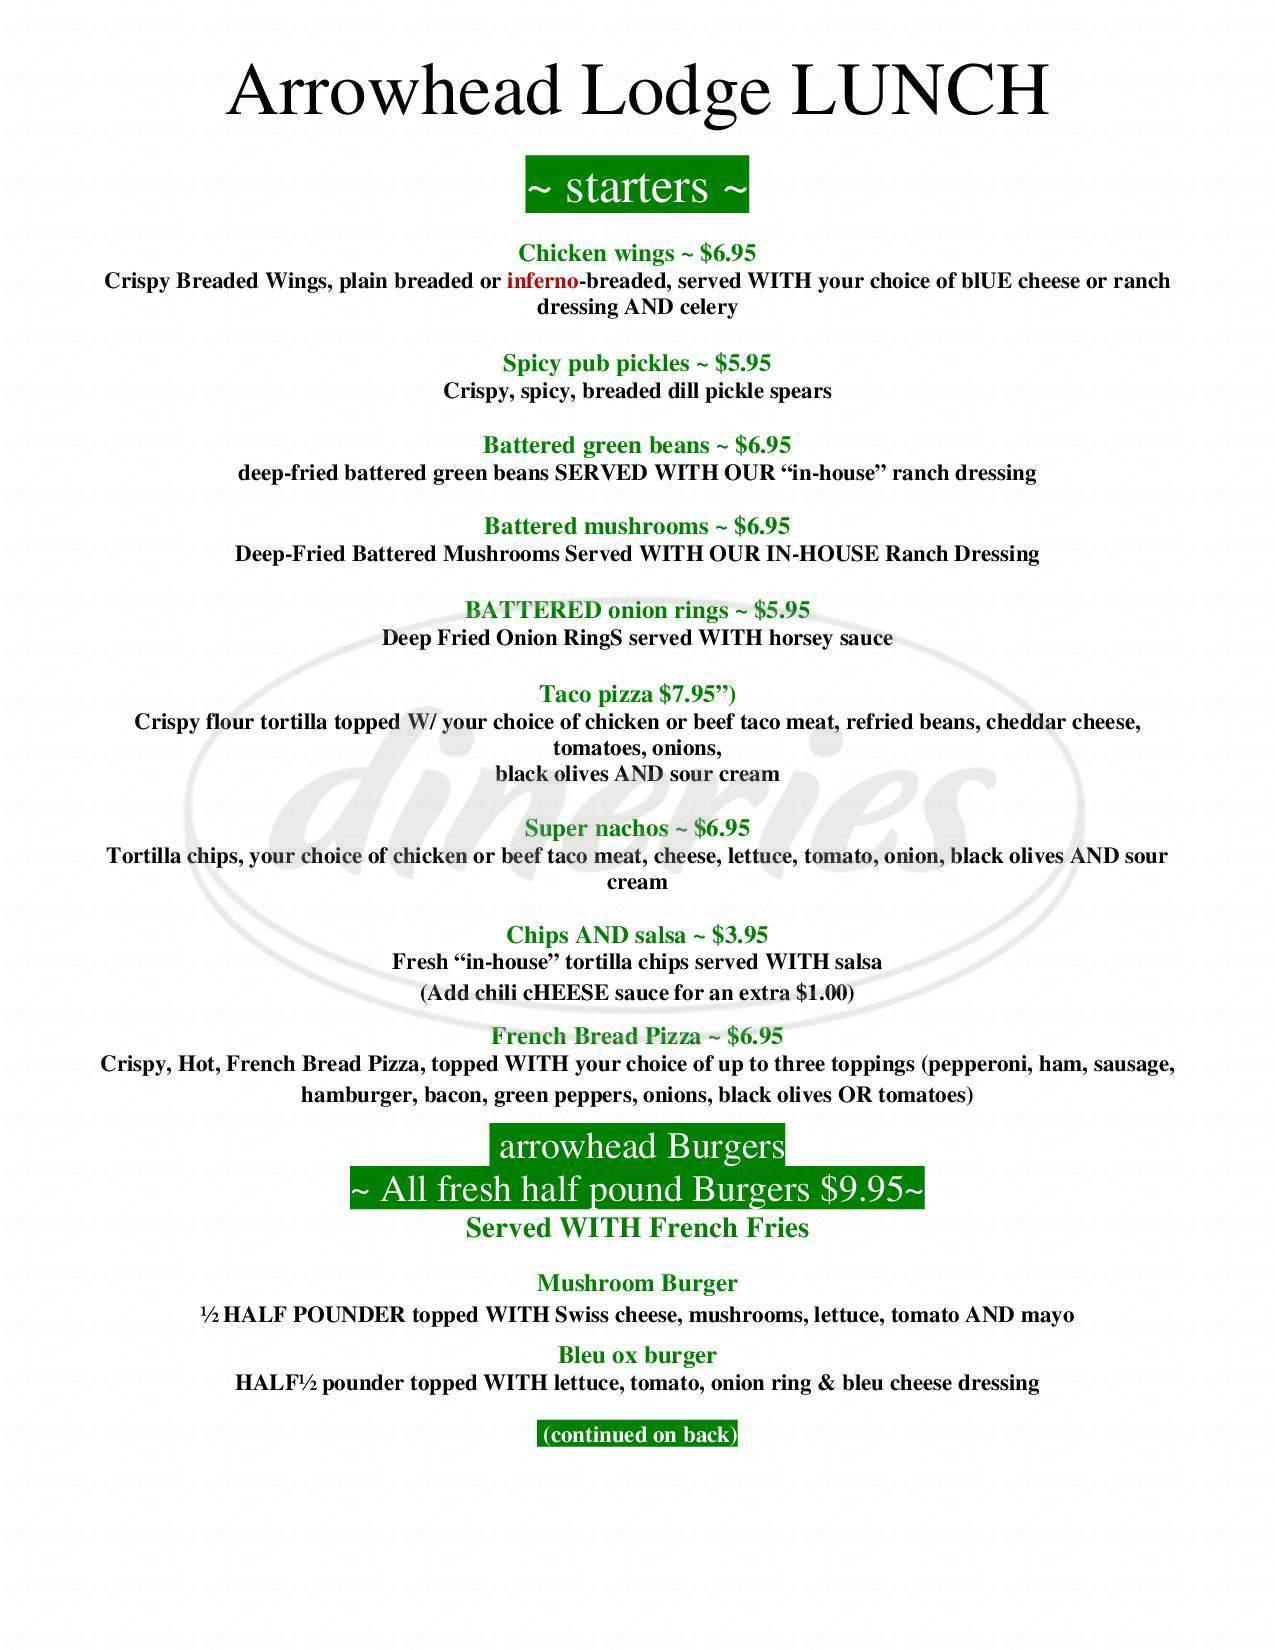 menu for Arrowhead Lodge